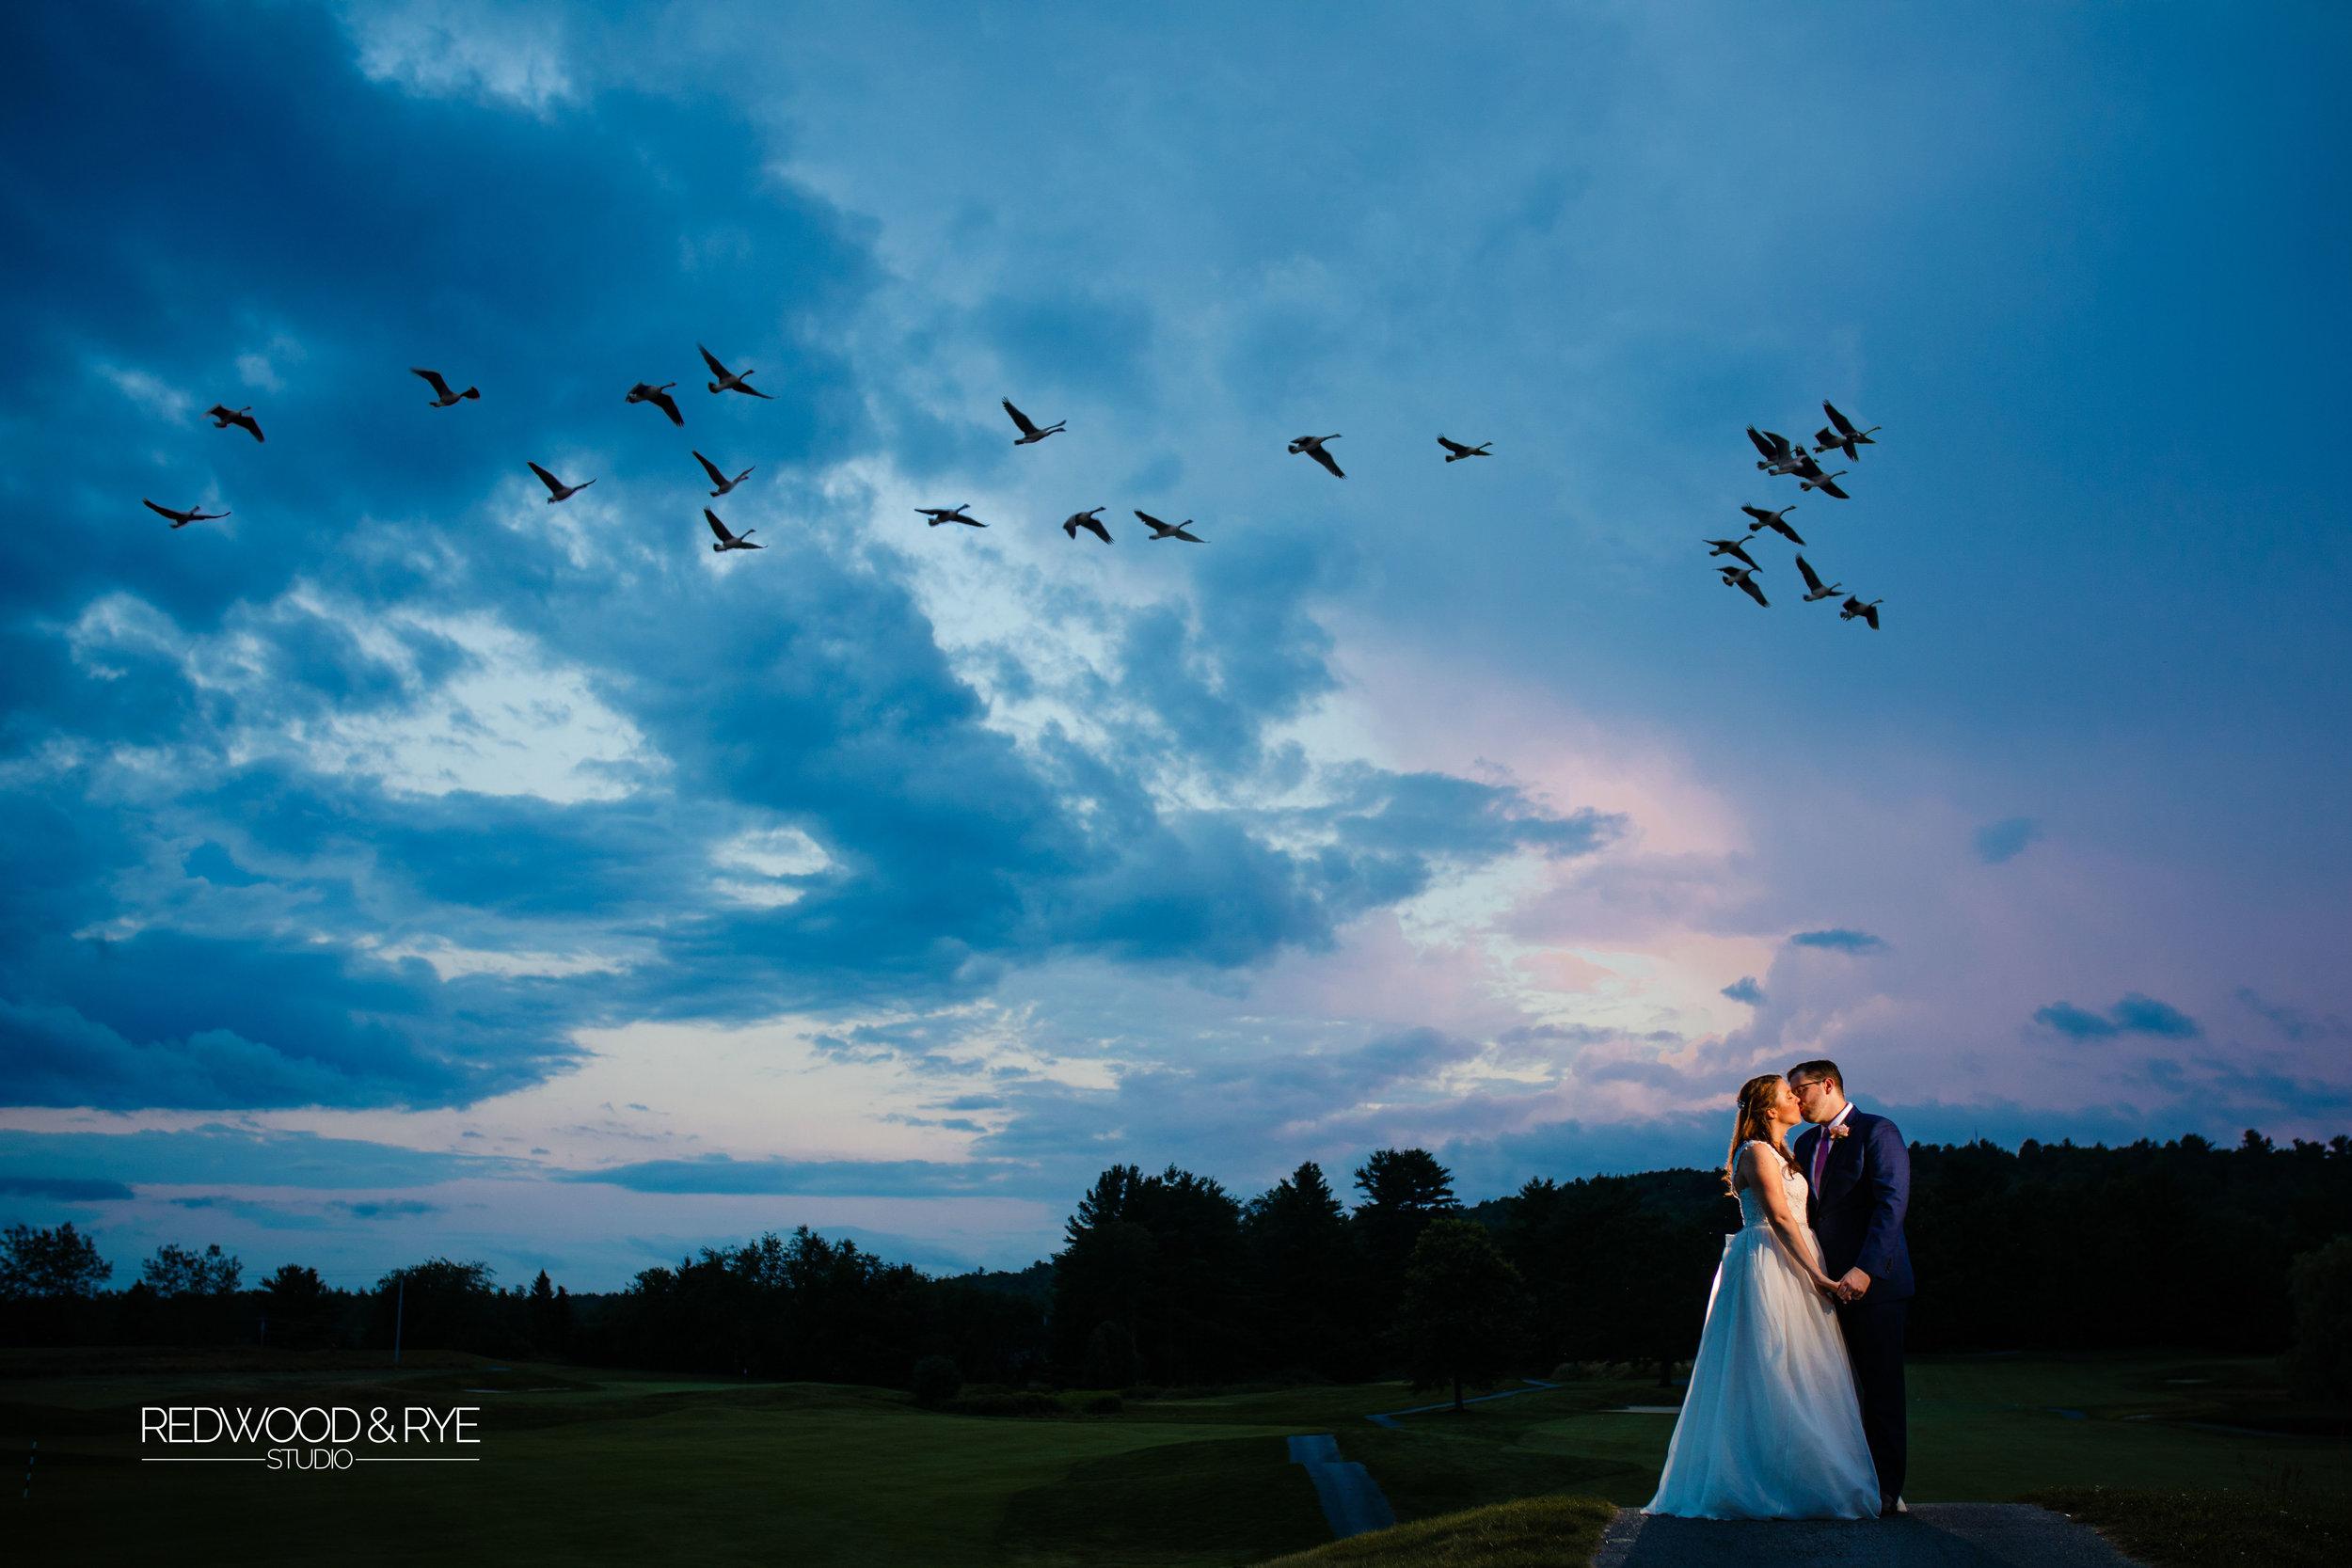 Redwood + Rye_Redbarn Wedding_Bride and Groom_Portriat -1.jpg